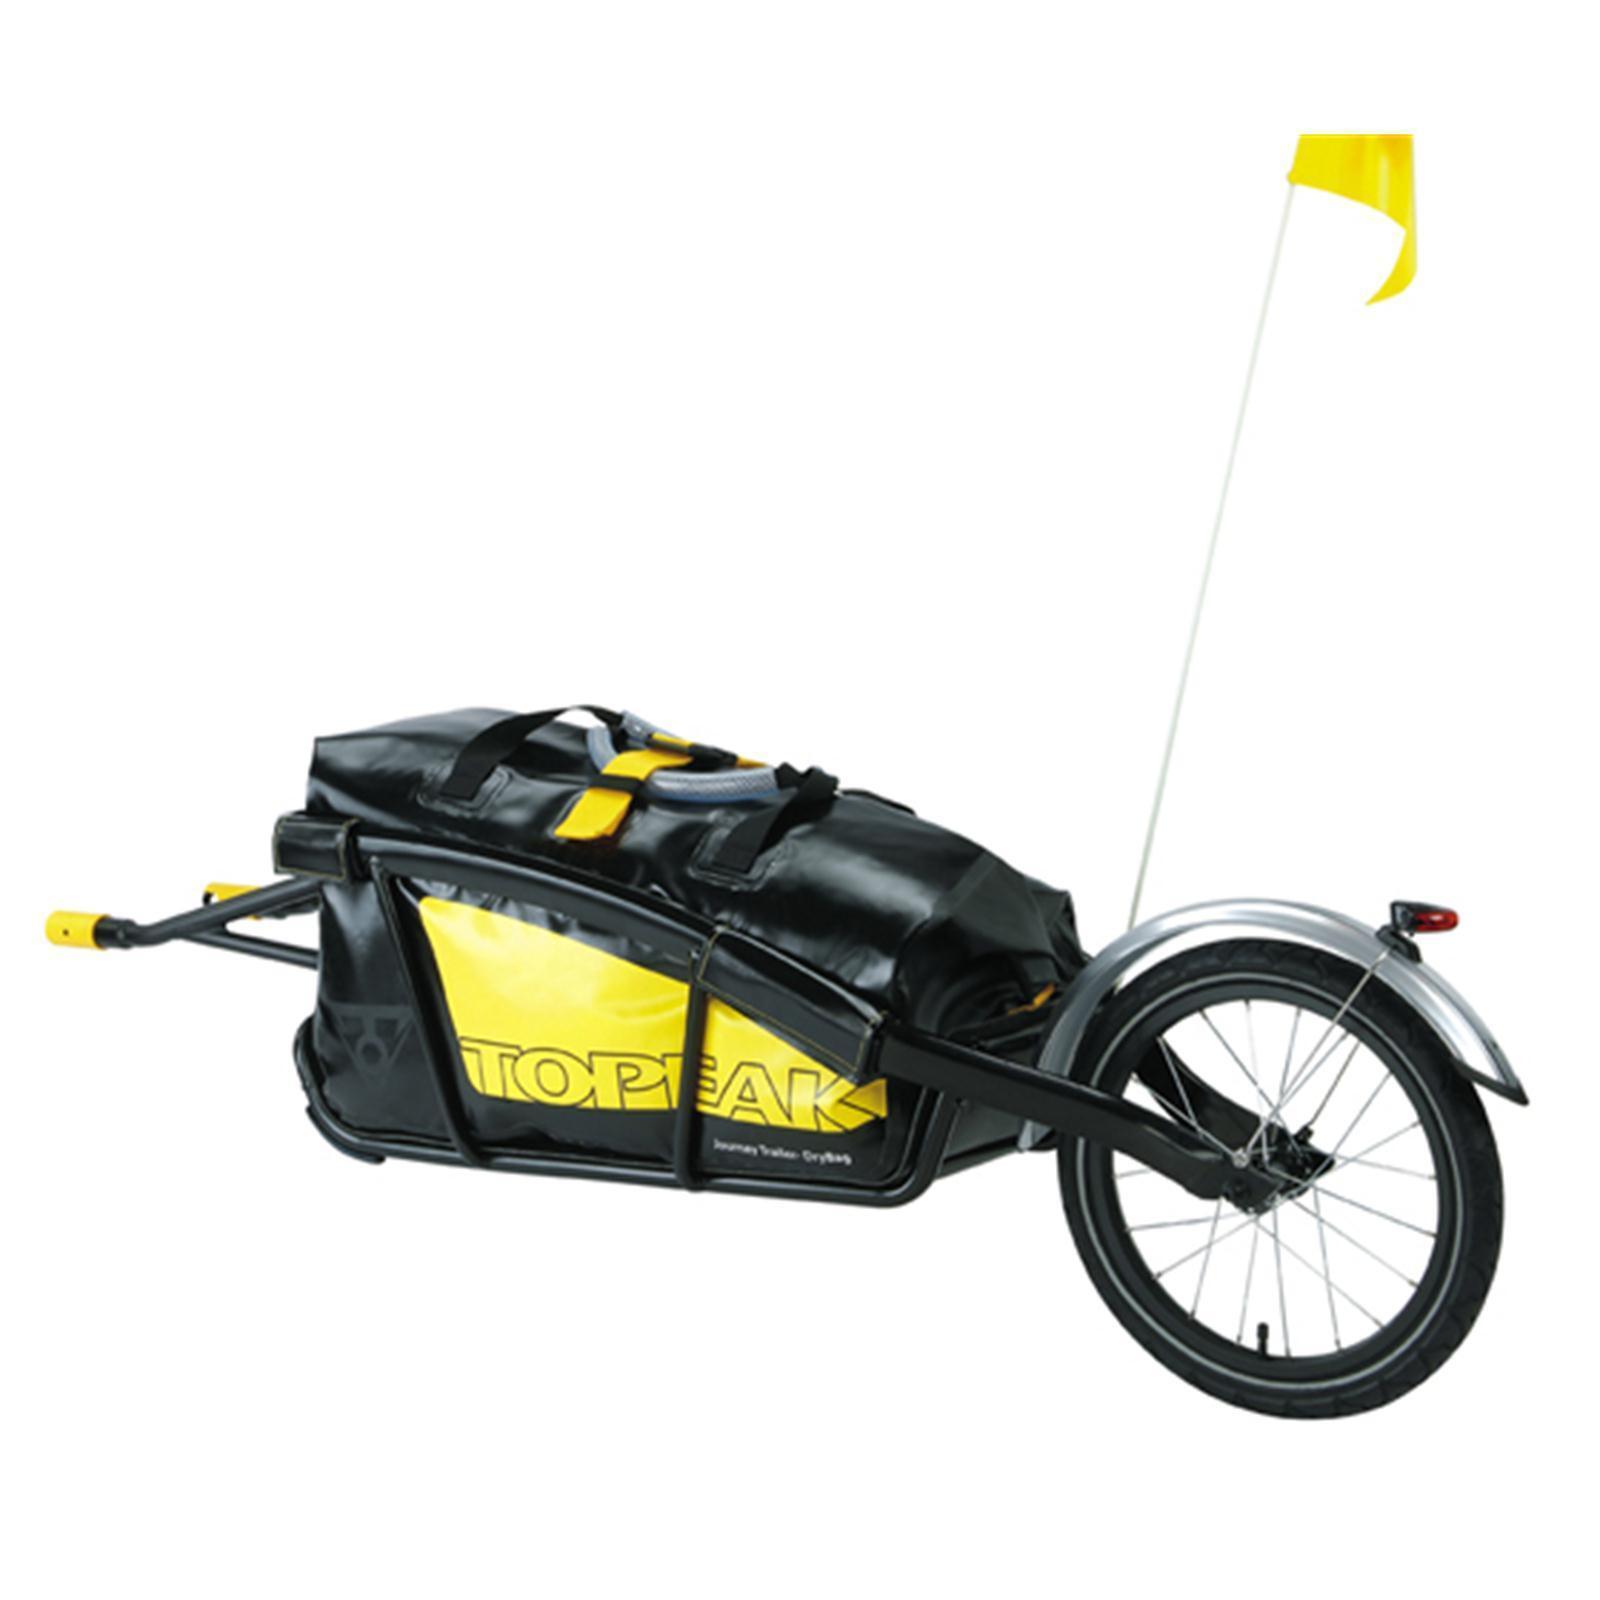 Remolque de viaje Topeak + bicicleta de transporte impermeable bolsa de viajes trailer